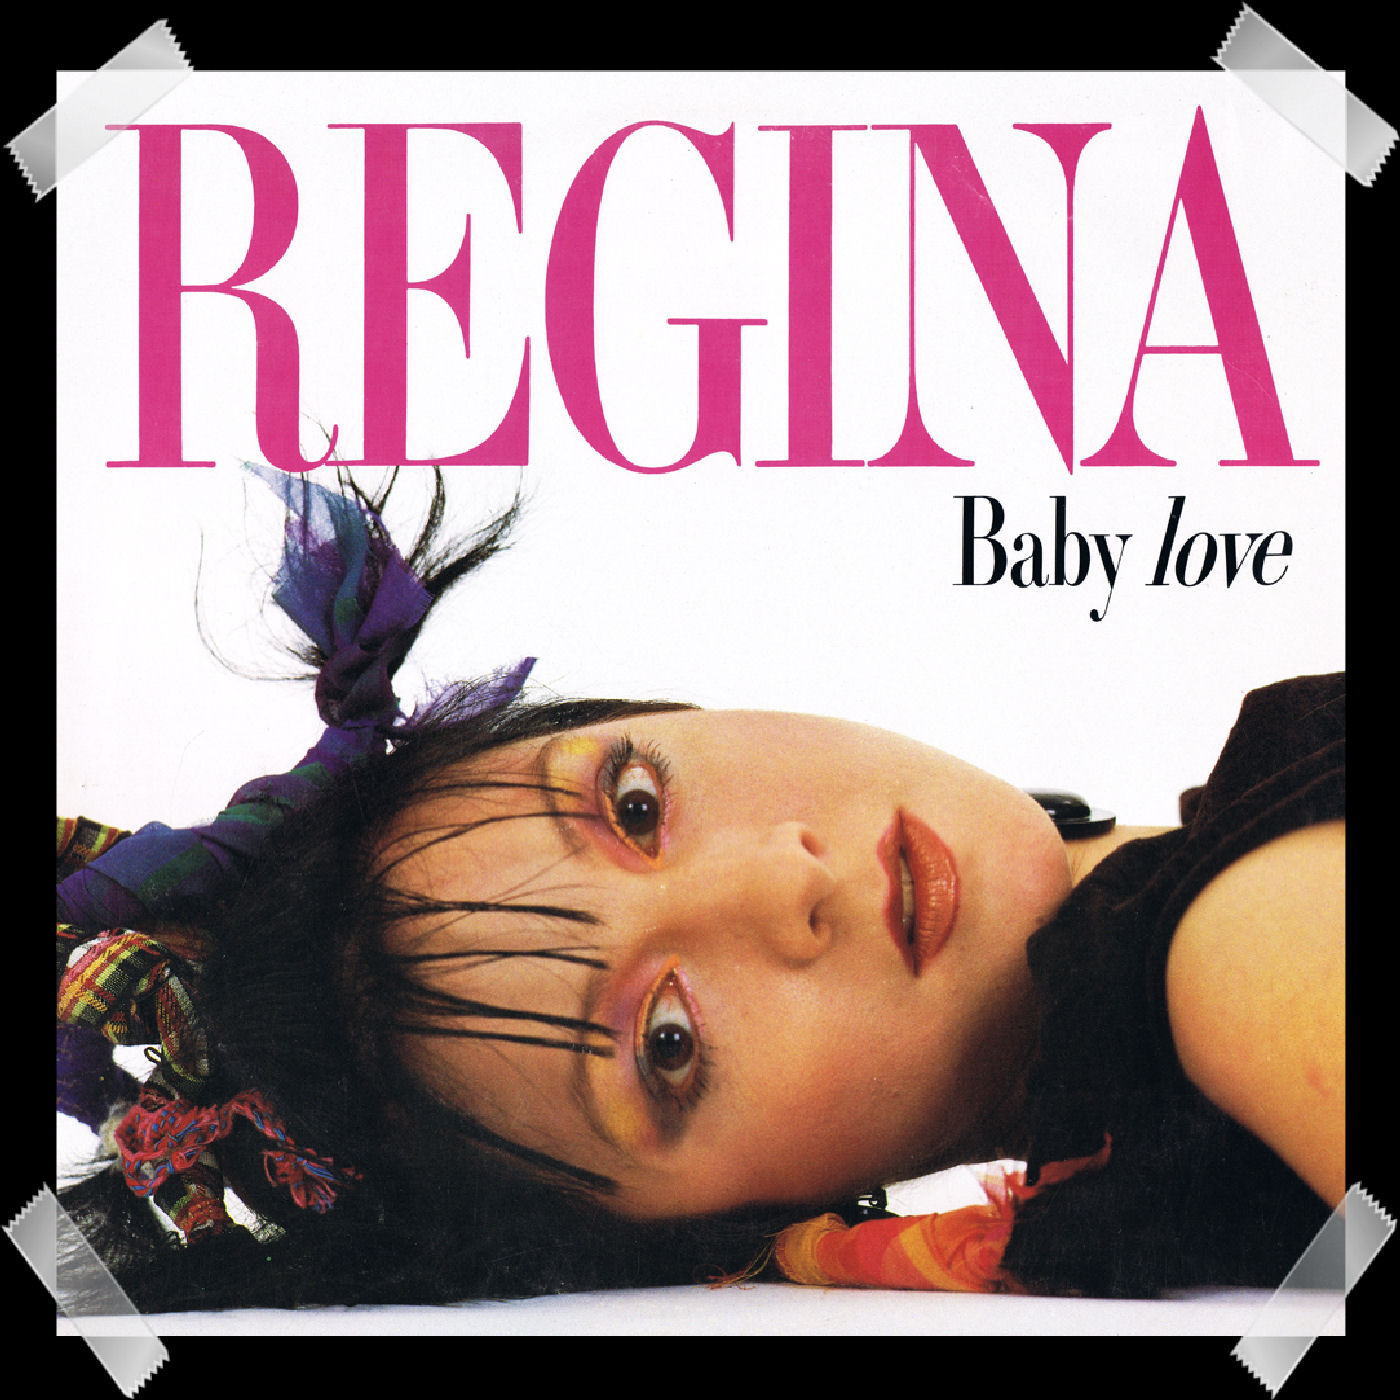 13. Regina - Baby Love